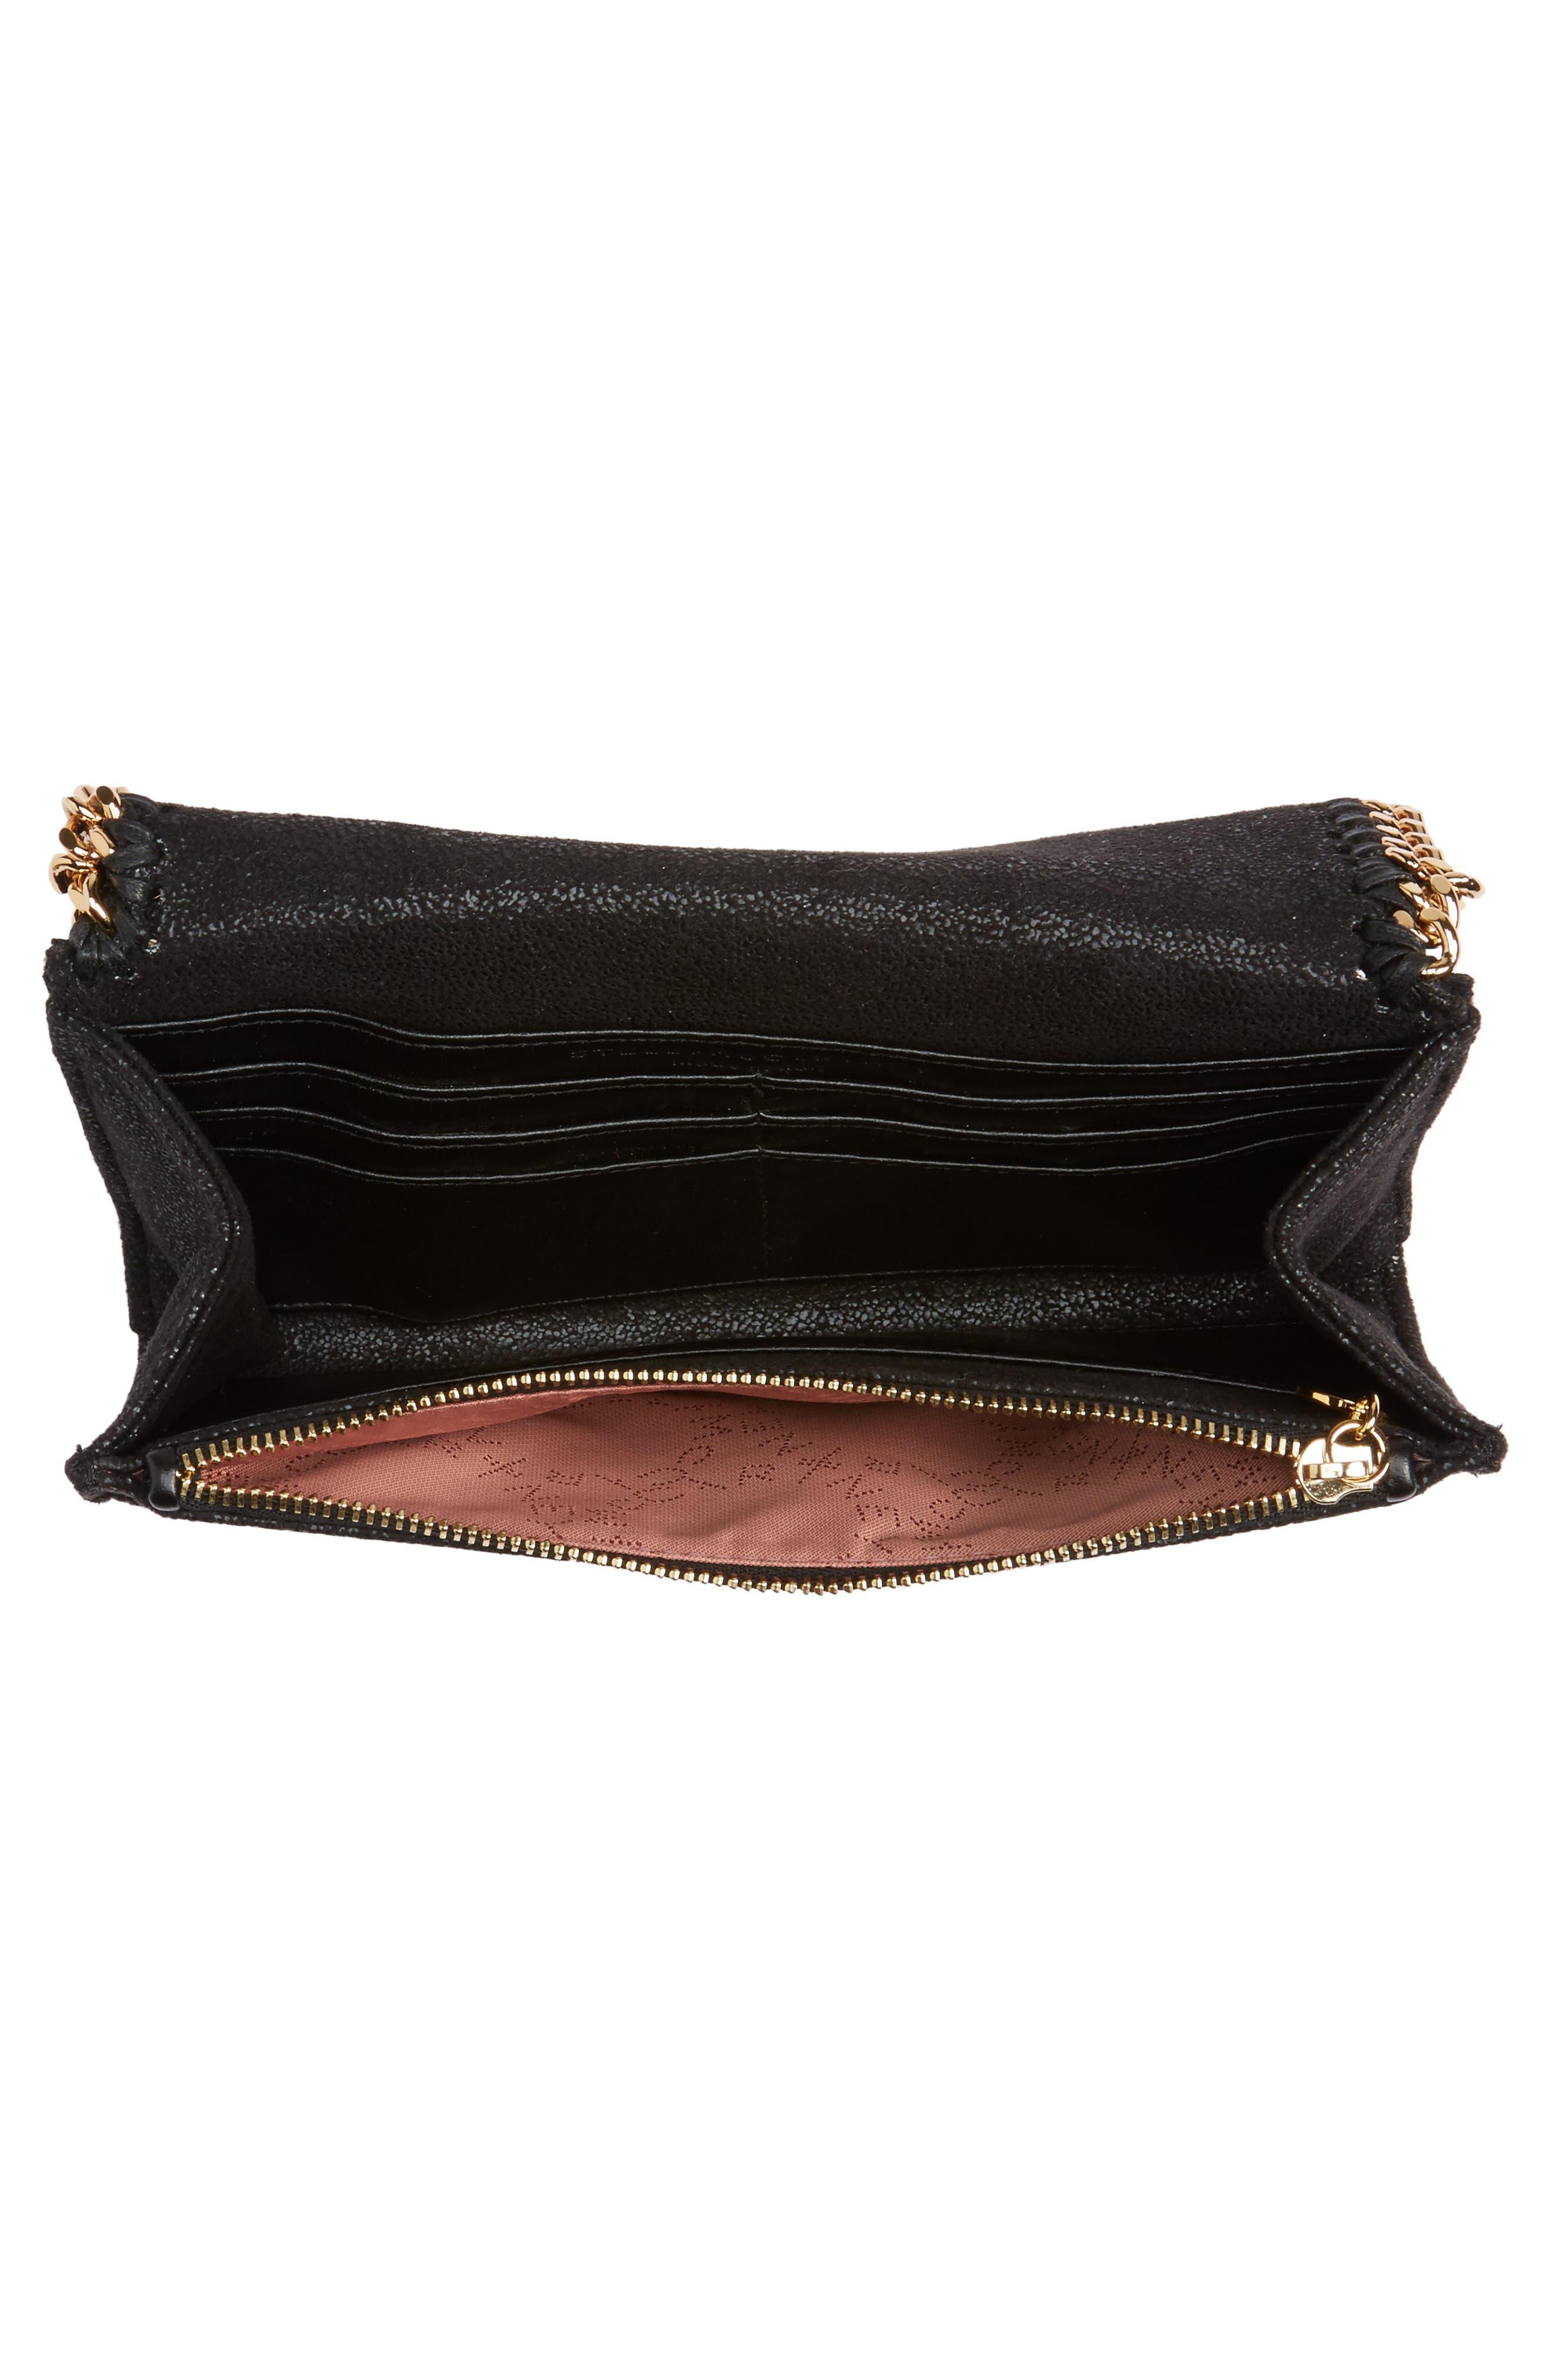 STELLA MCCARTNEY,                             Shaggy Deer Faux Leather Crossbody Bag,                             Alternate thumbnail 4, color,                             BLACK